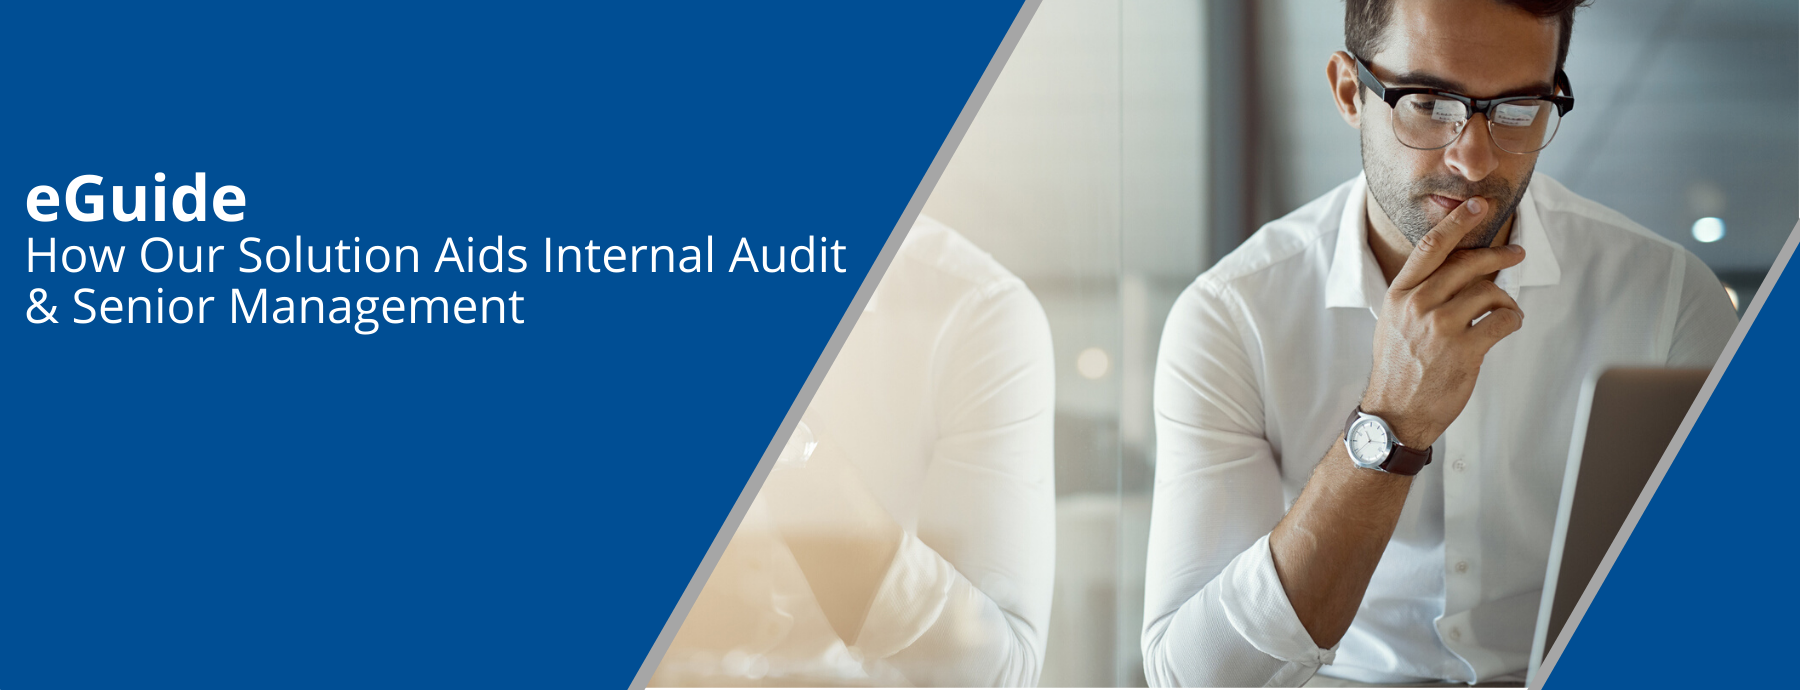 How Our Solution Aids Internal Audit & Senior Management